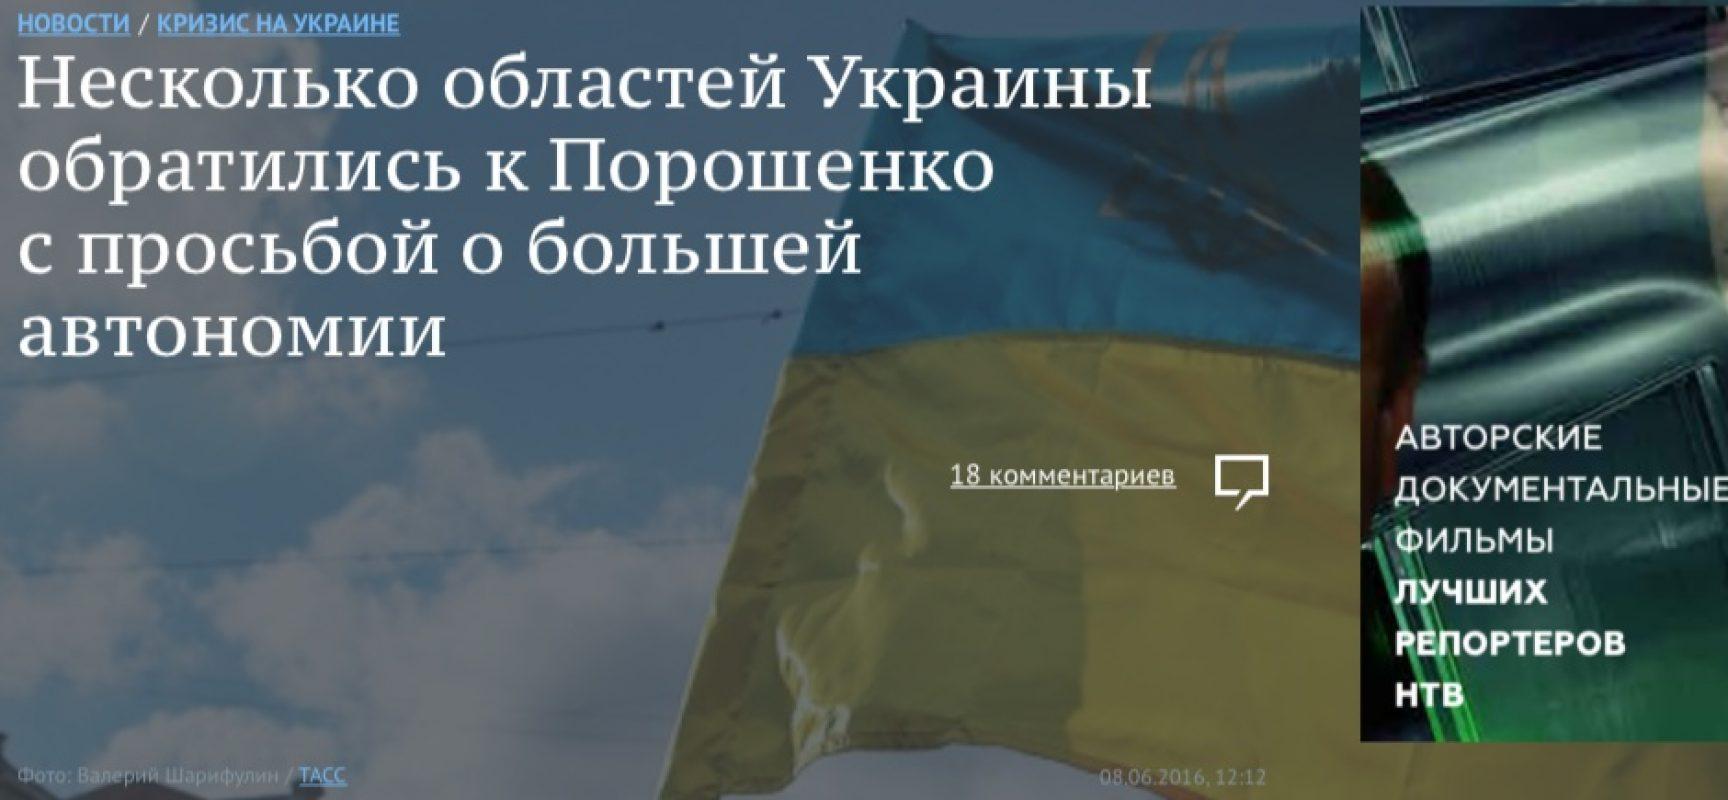 Fake: Alcune regioni ucraine chiedono l'autonomia